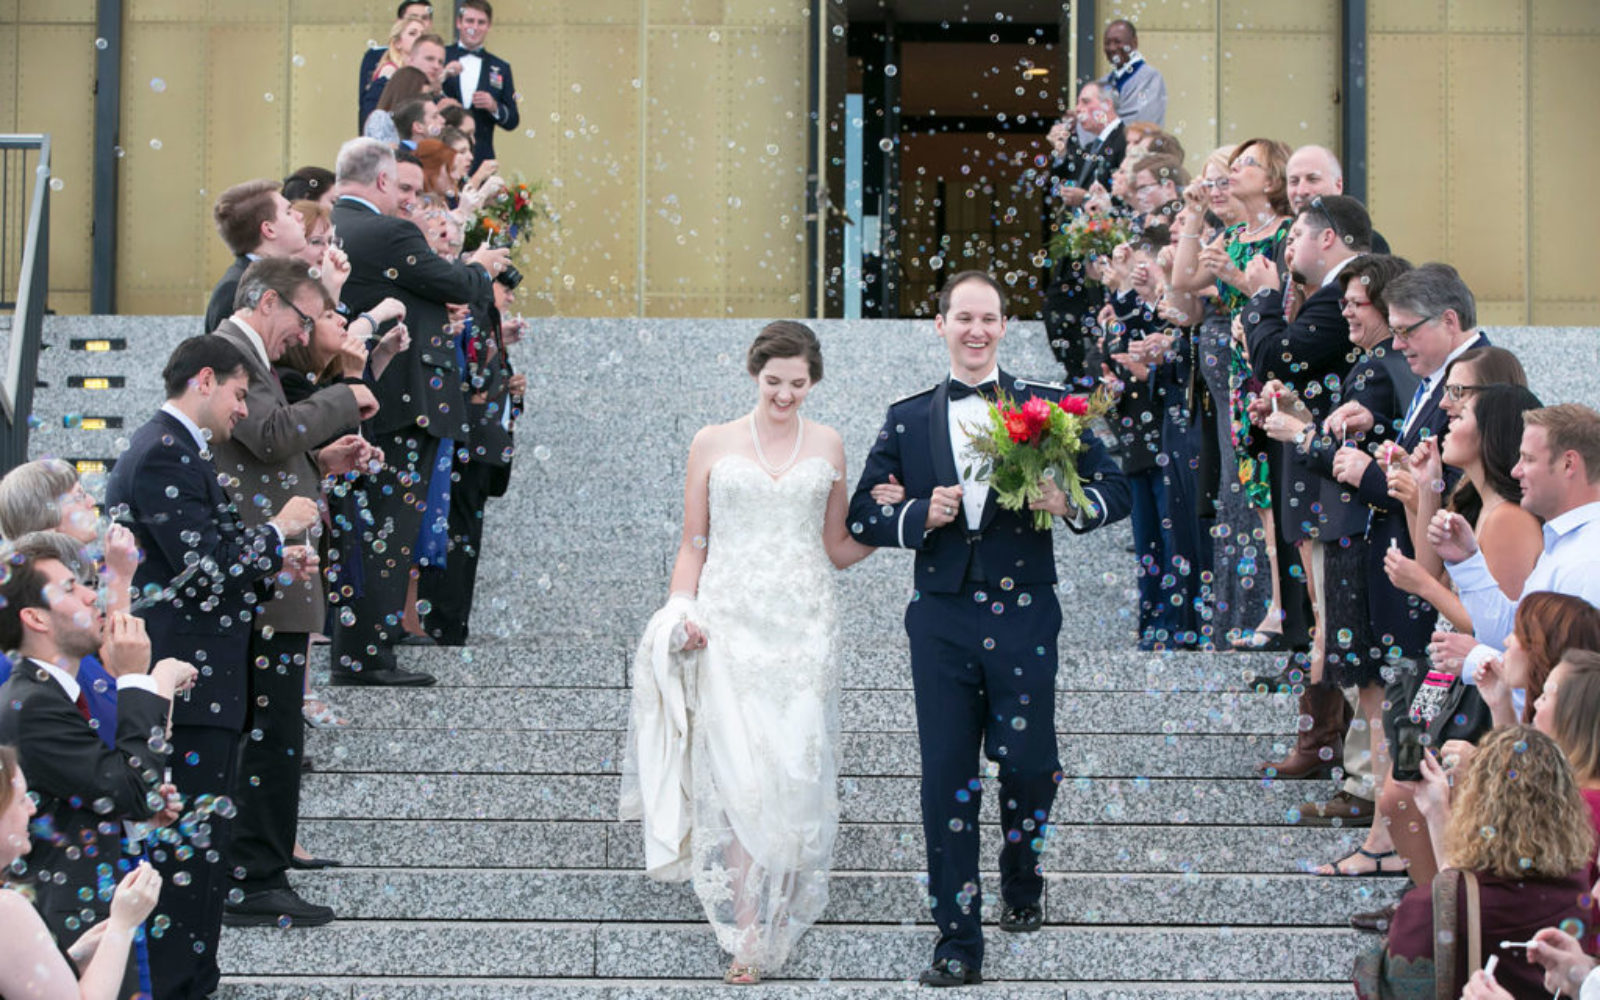 weddingphotographycoloradosprings_44-1024x640